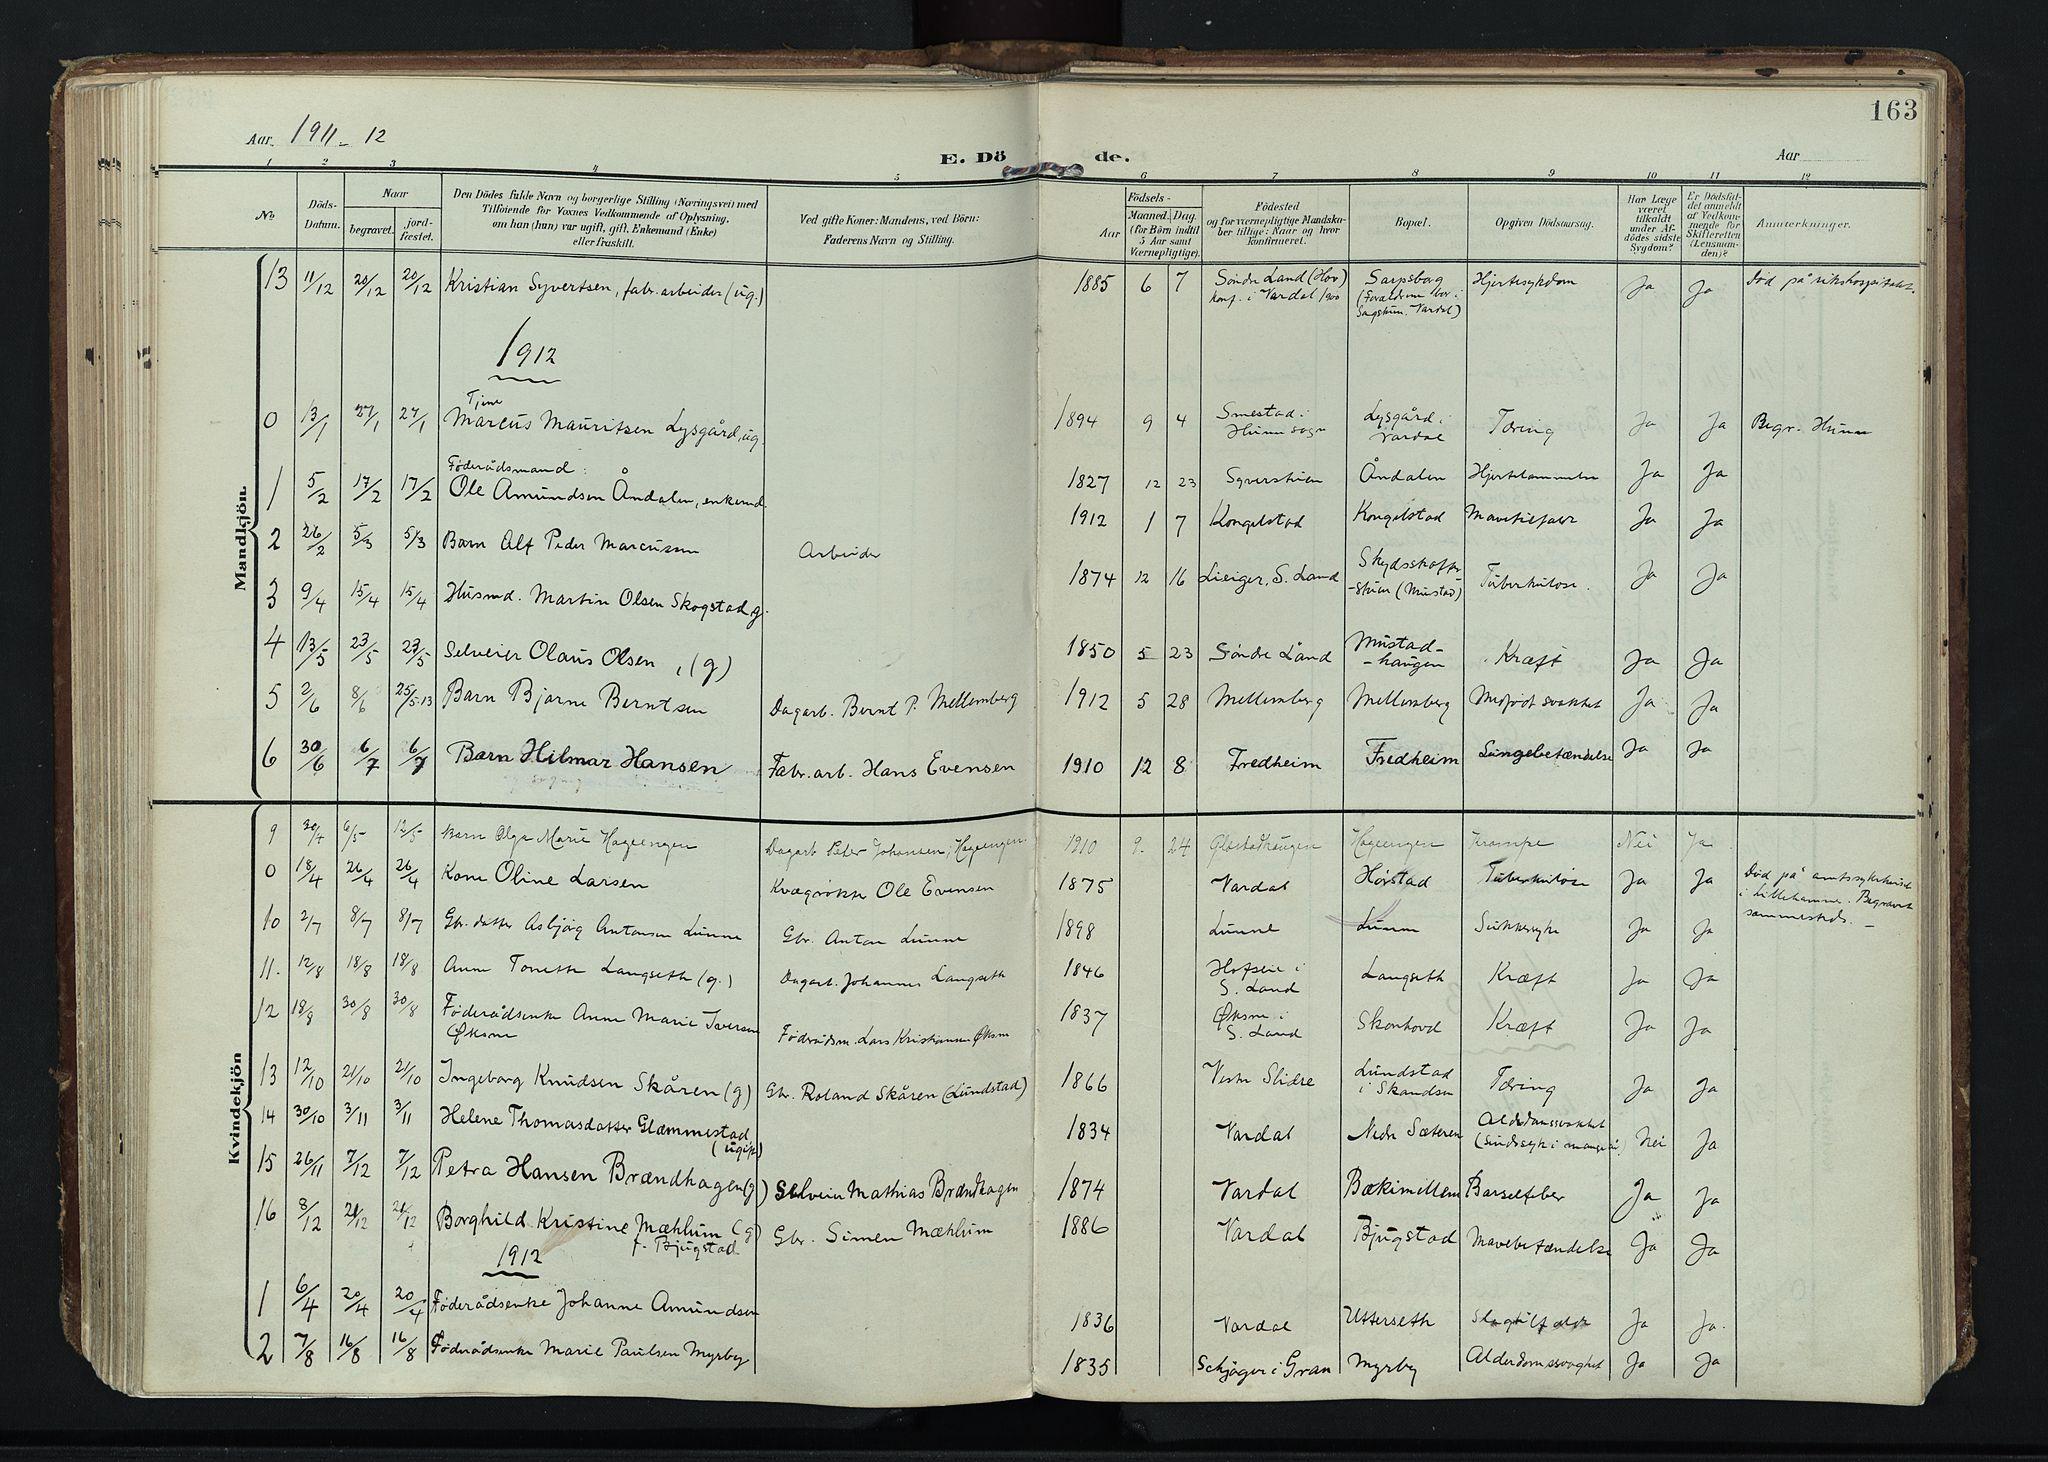 SAH, Vardal prestekontor, H/Ha/Haa/L0020: Ministerialbok nr. 20, 1907-1921, s. 163